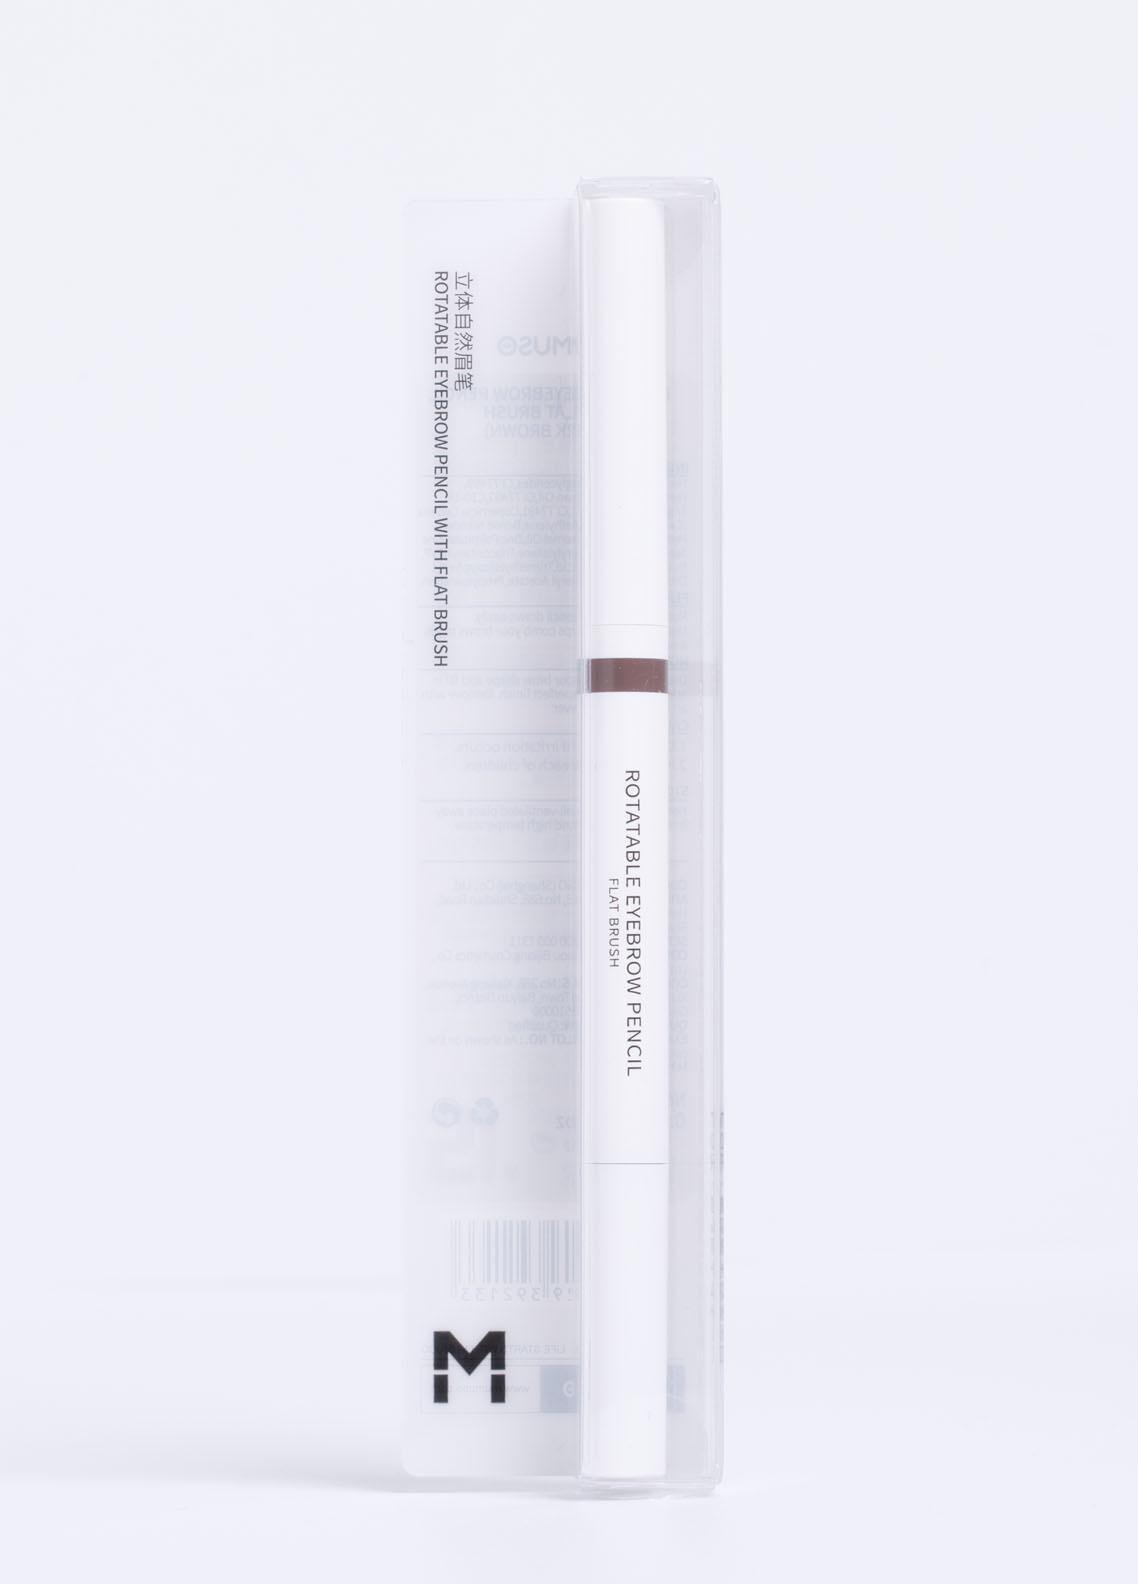 Mumuso ROTATABLE EYEBROW PENCIL WITH FLAT BRUSH (8 DARK BROWN)